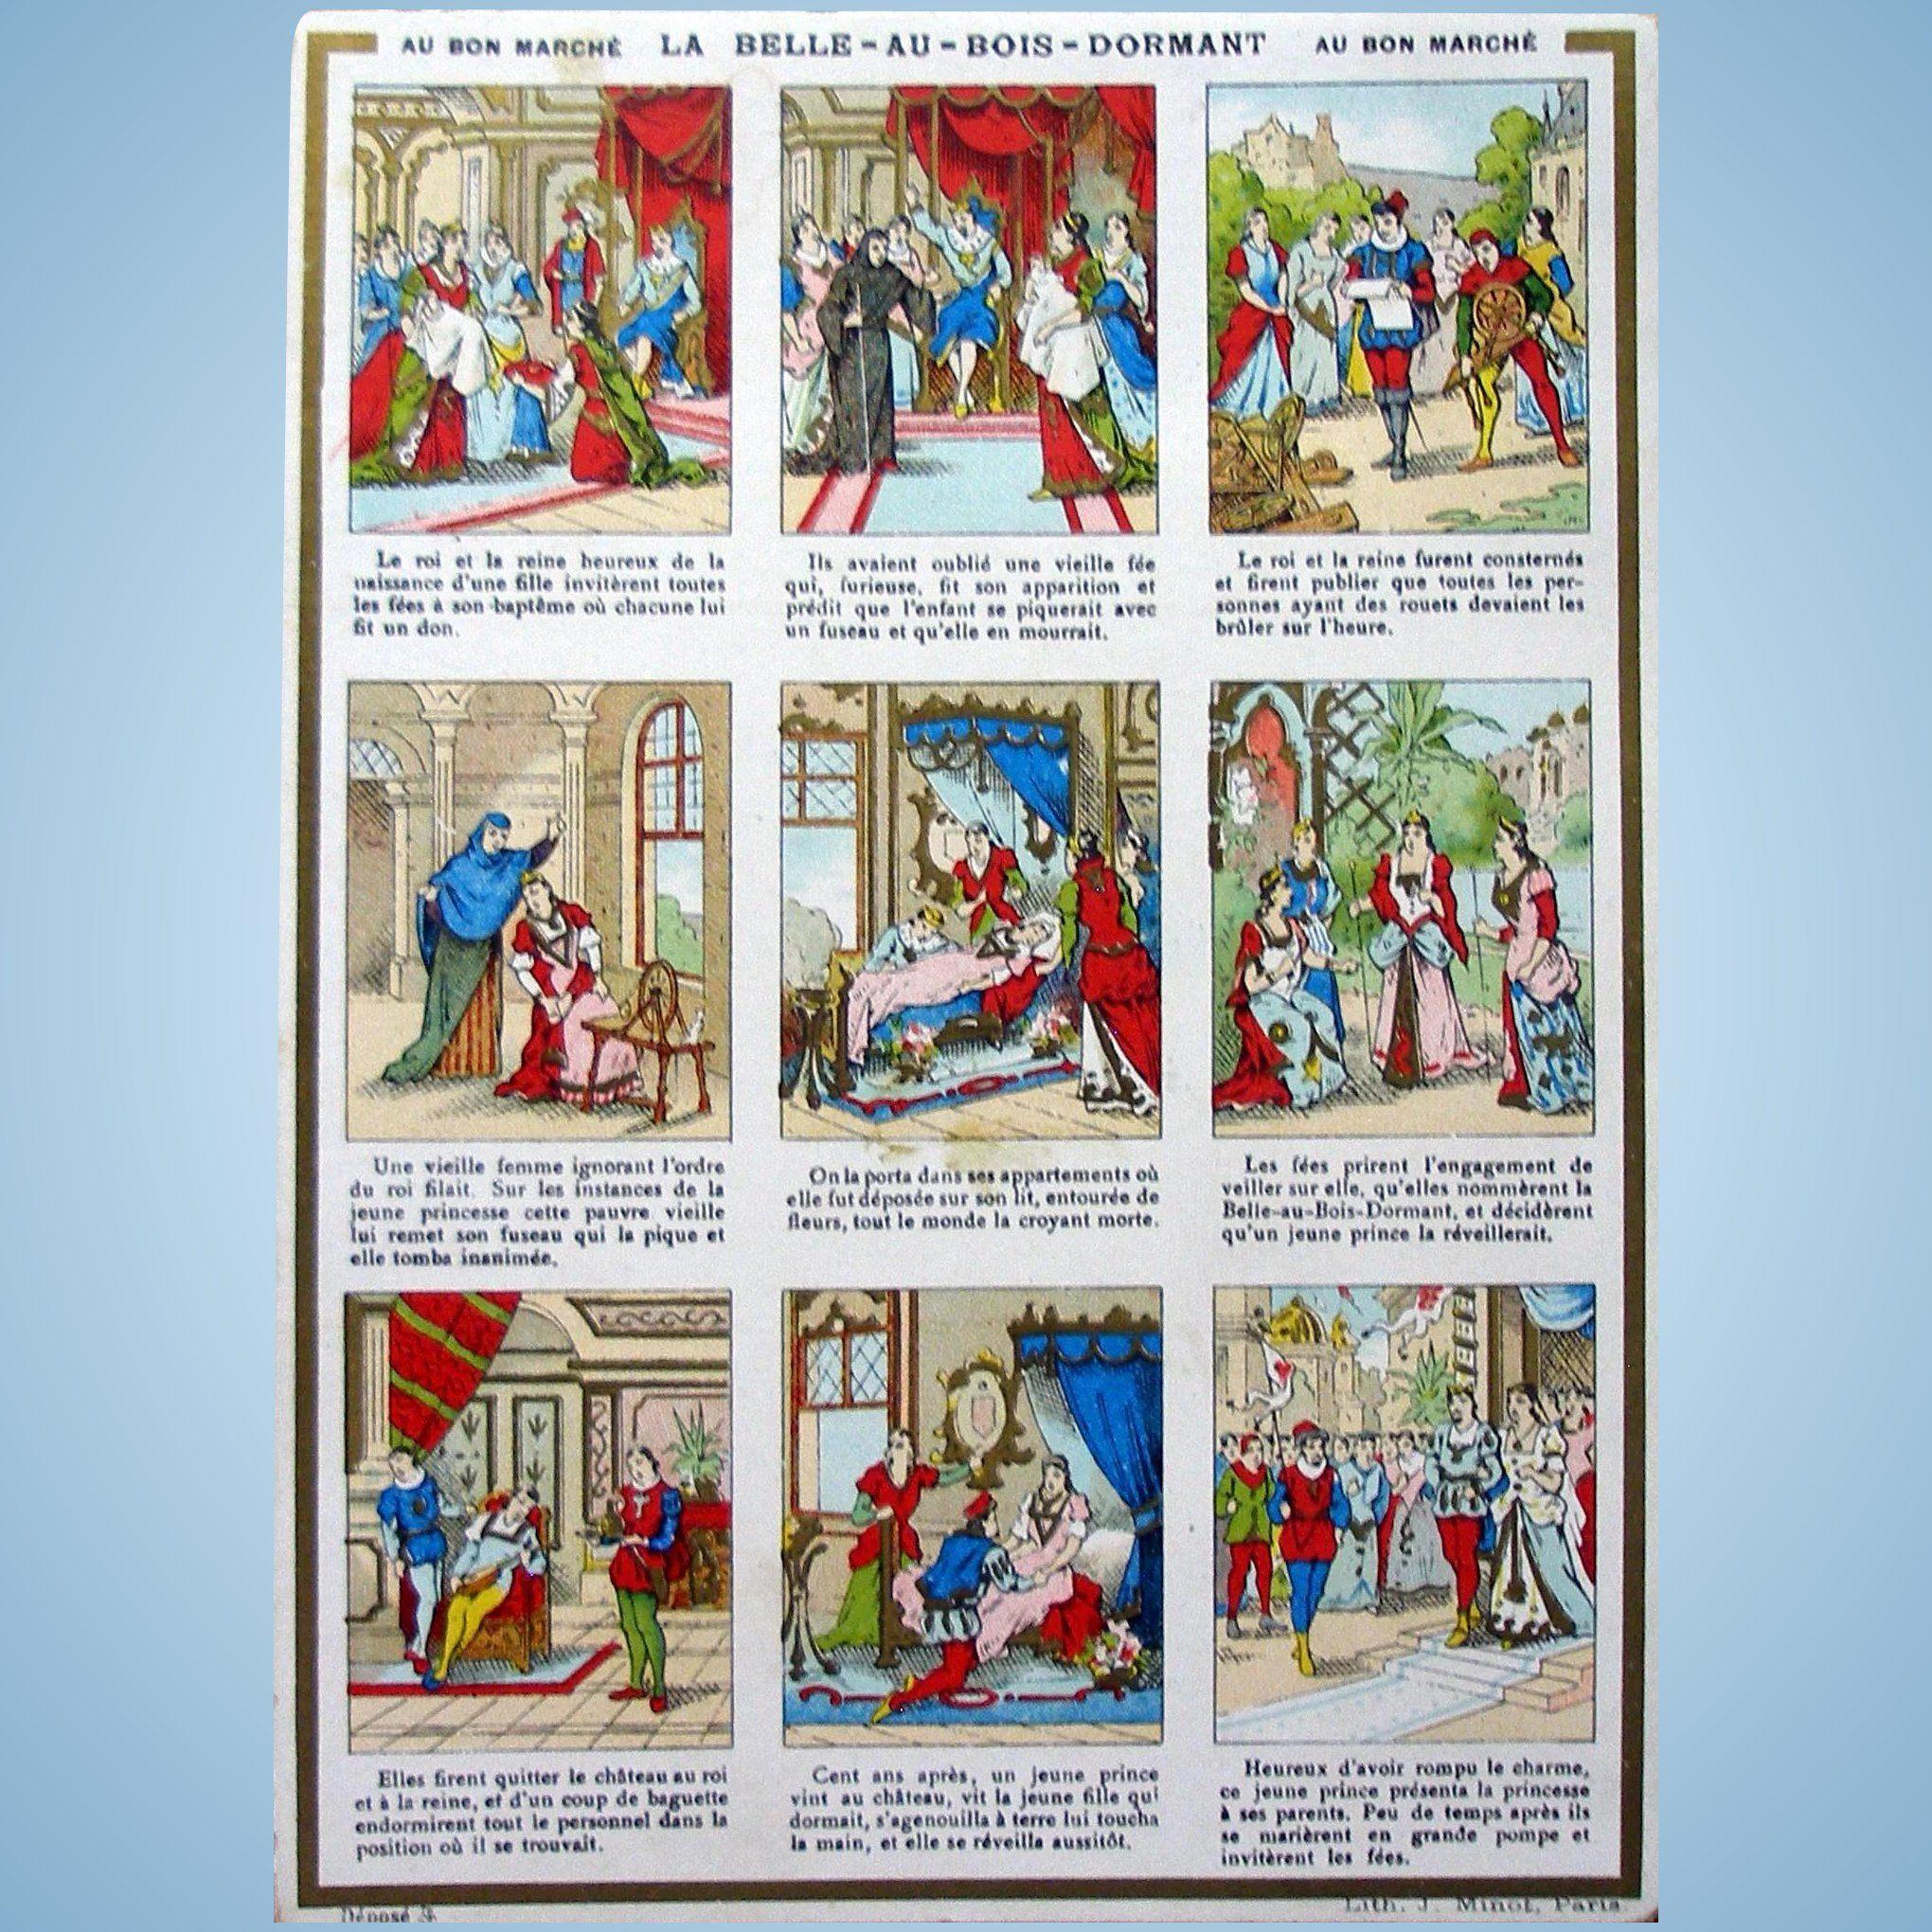 Grand Lit Bebe Magnifique Au Bon Marche Sleeping Beauty Trade Card From France